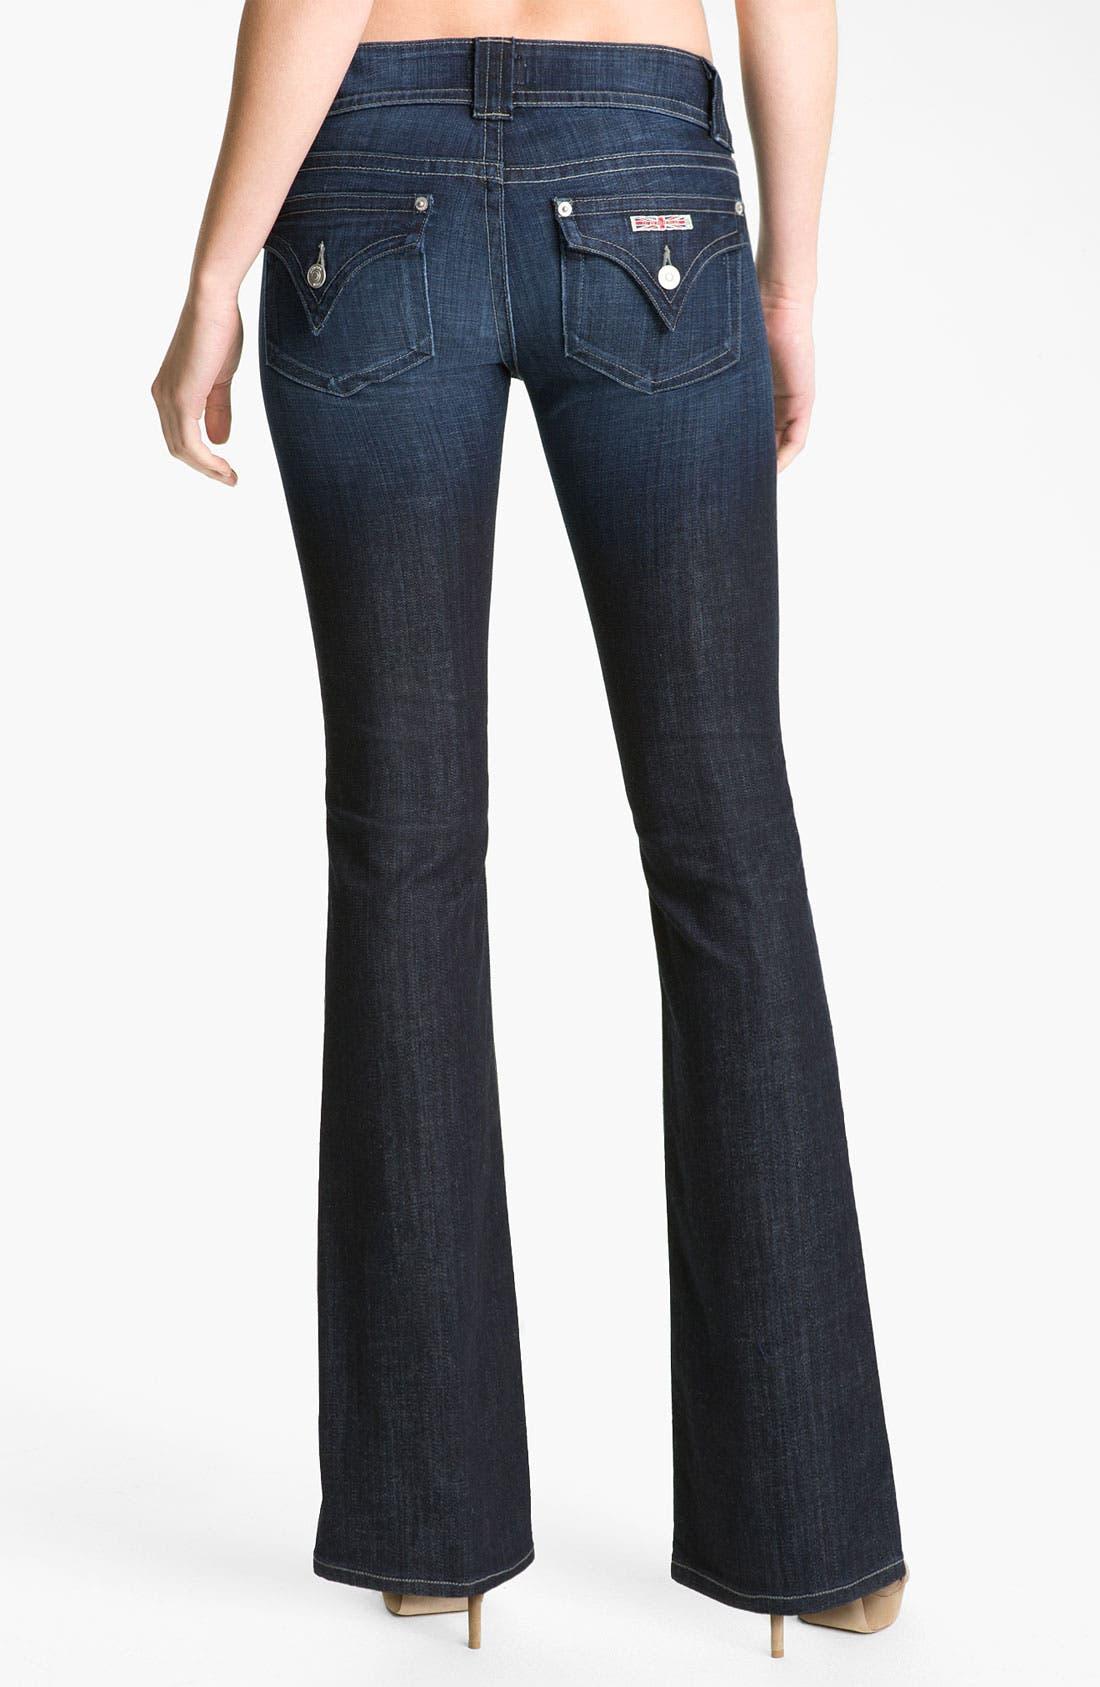 Alternate Image 2  - Hudson Jeans Signature Flap Pocket Bootcut Jeans (Bowery)